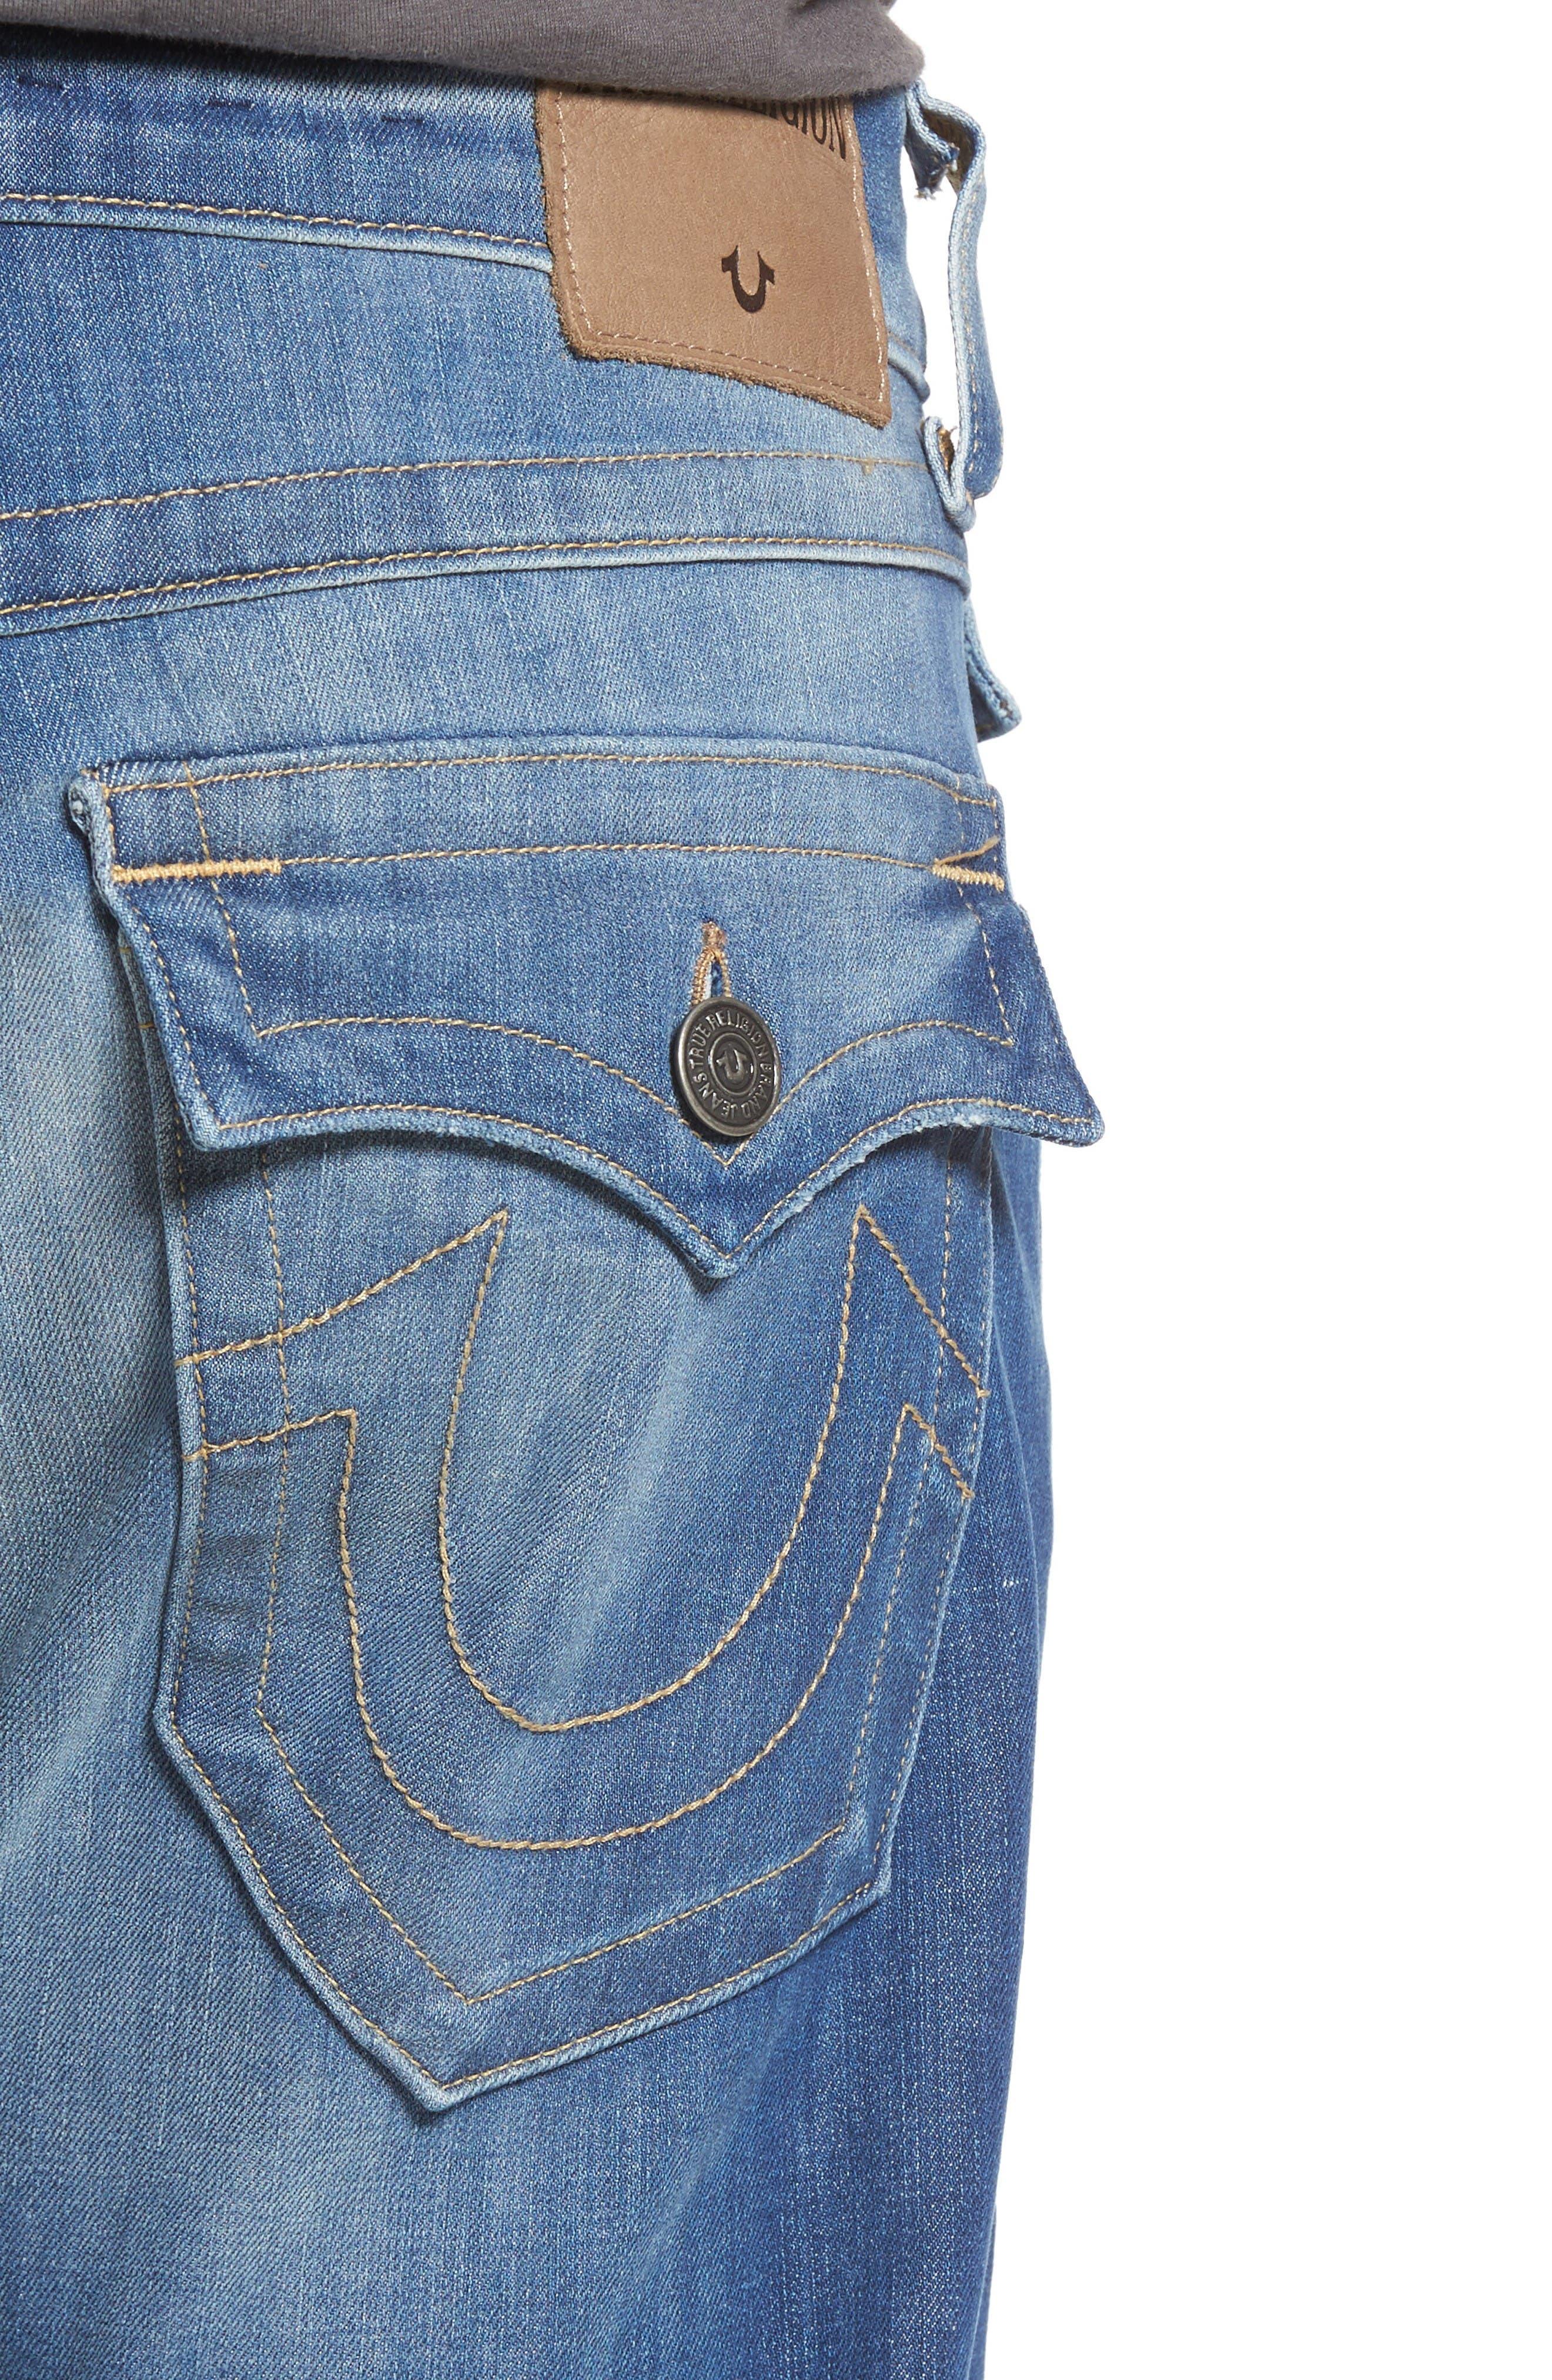 Alternate Image 4  - True Religion Brand Jeans Geno Straight Leg Jeans (Sun Faded)